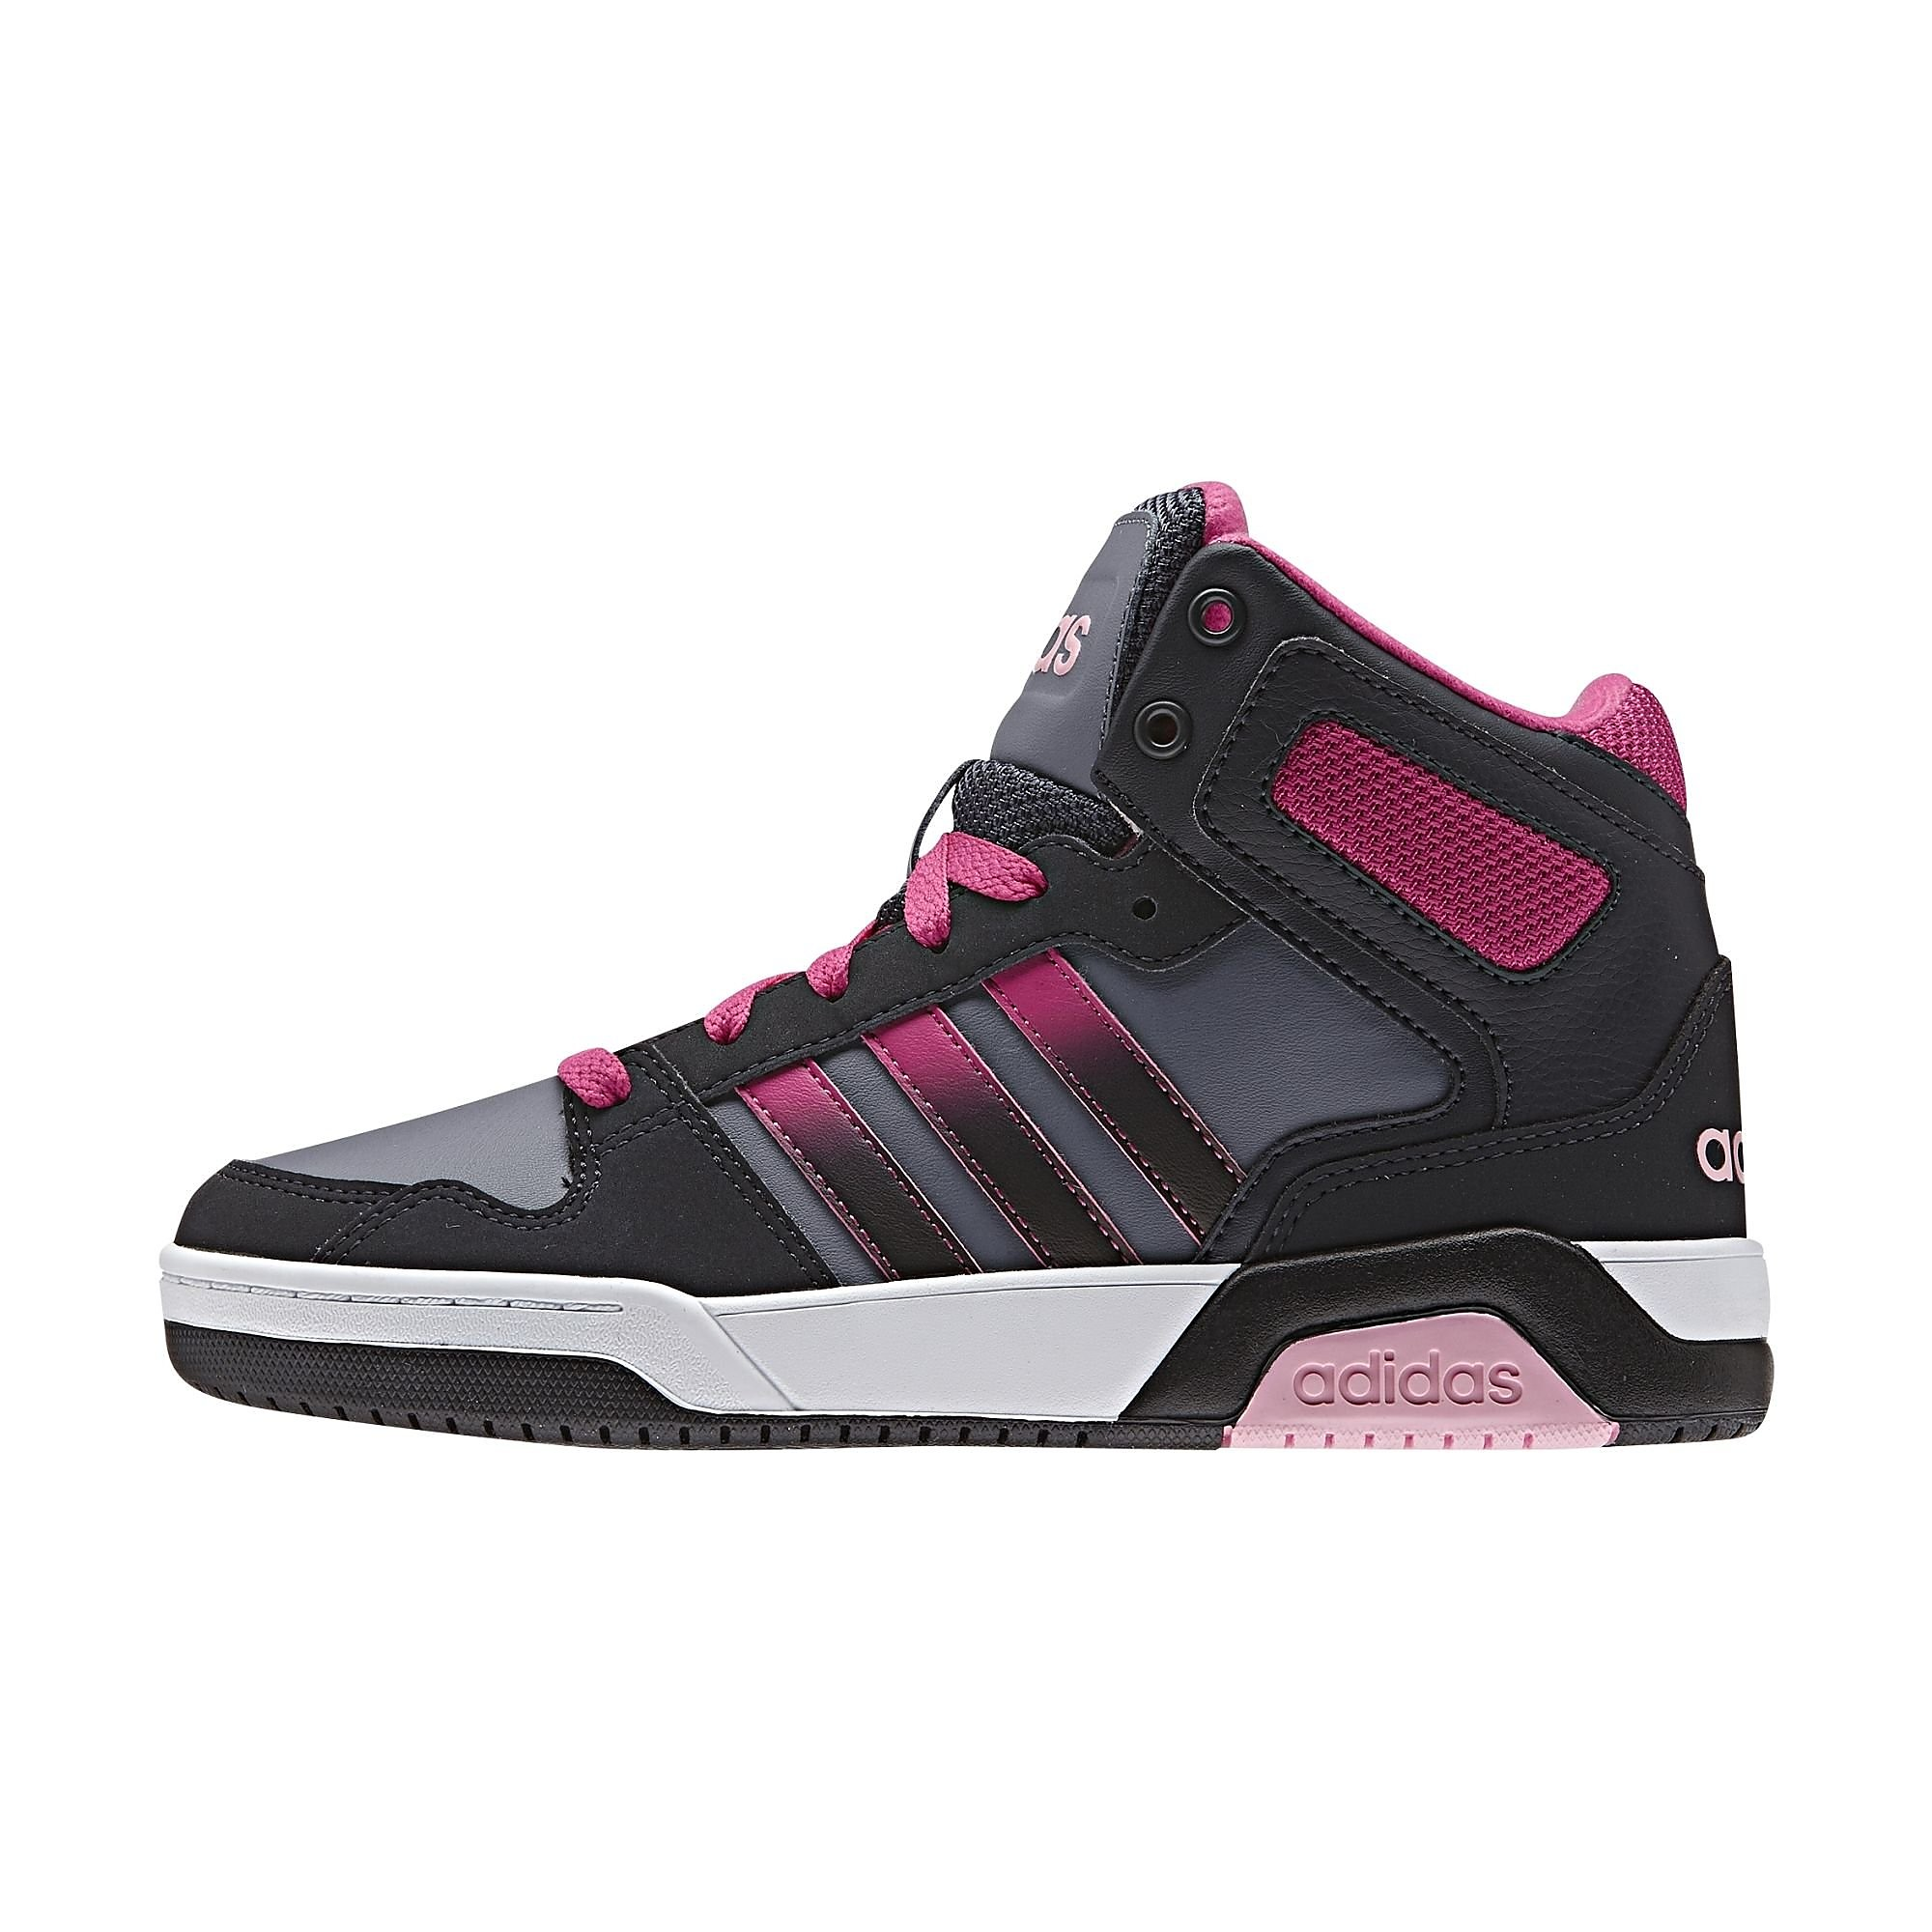 adidas BB9TIS MID GS